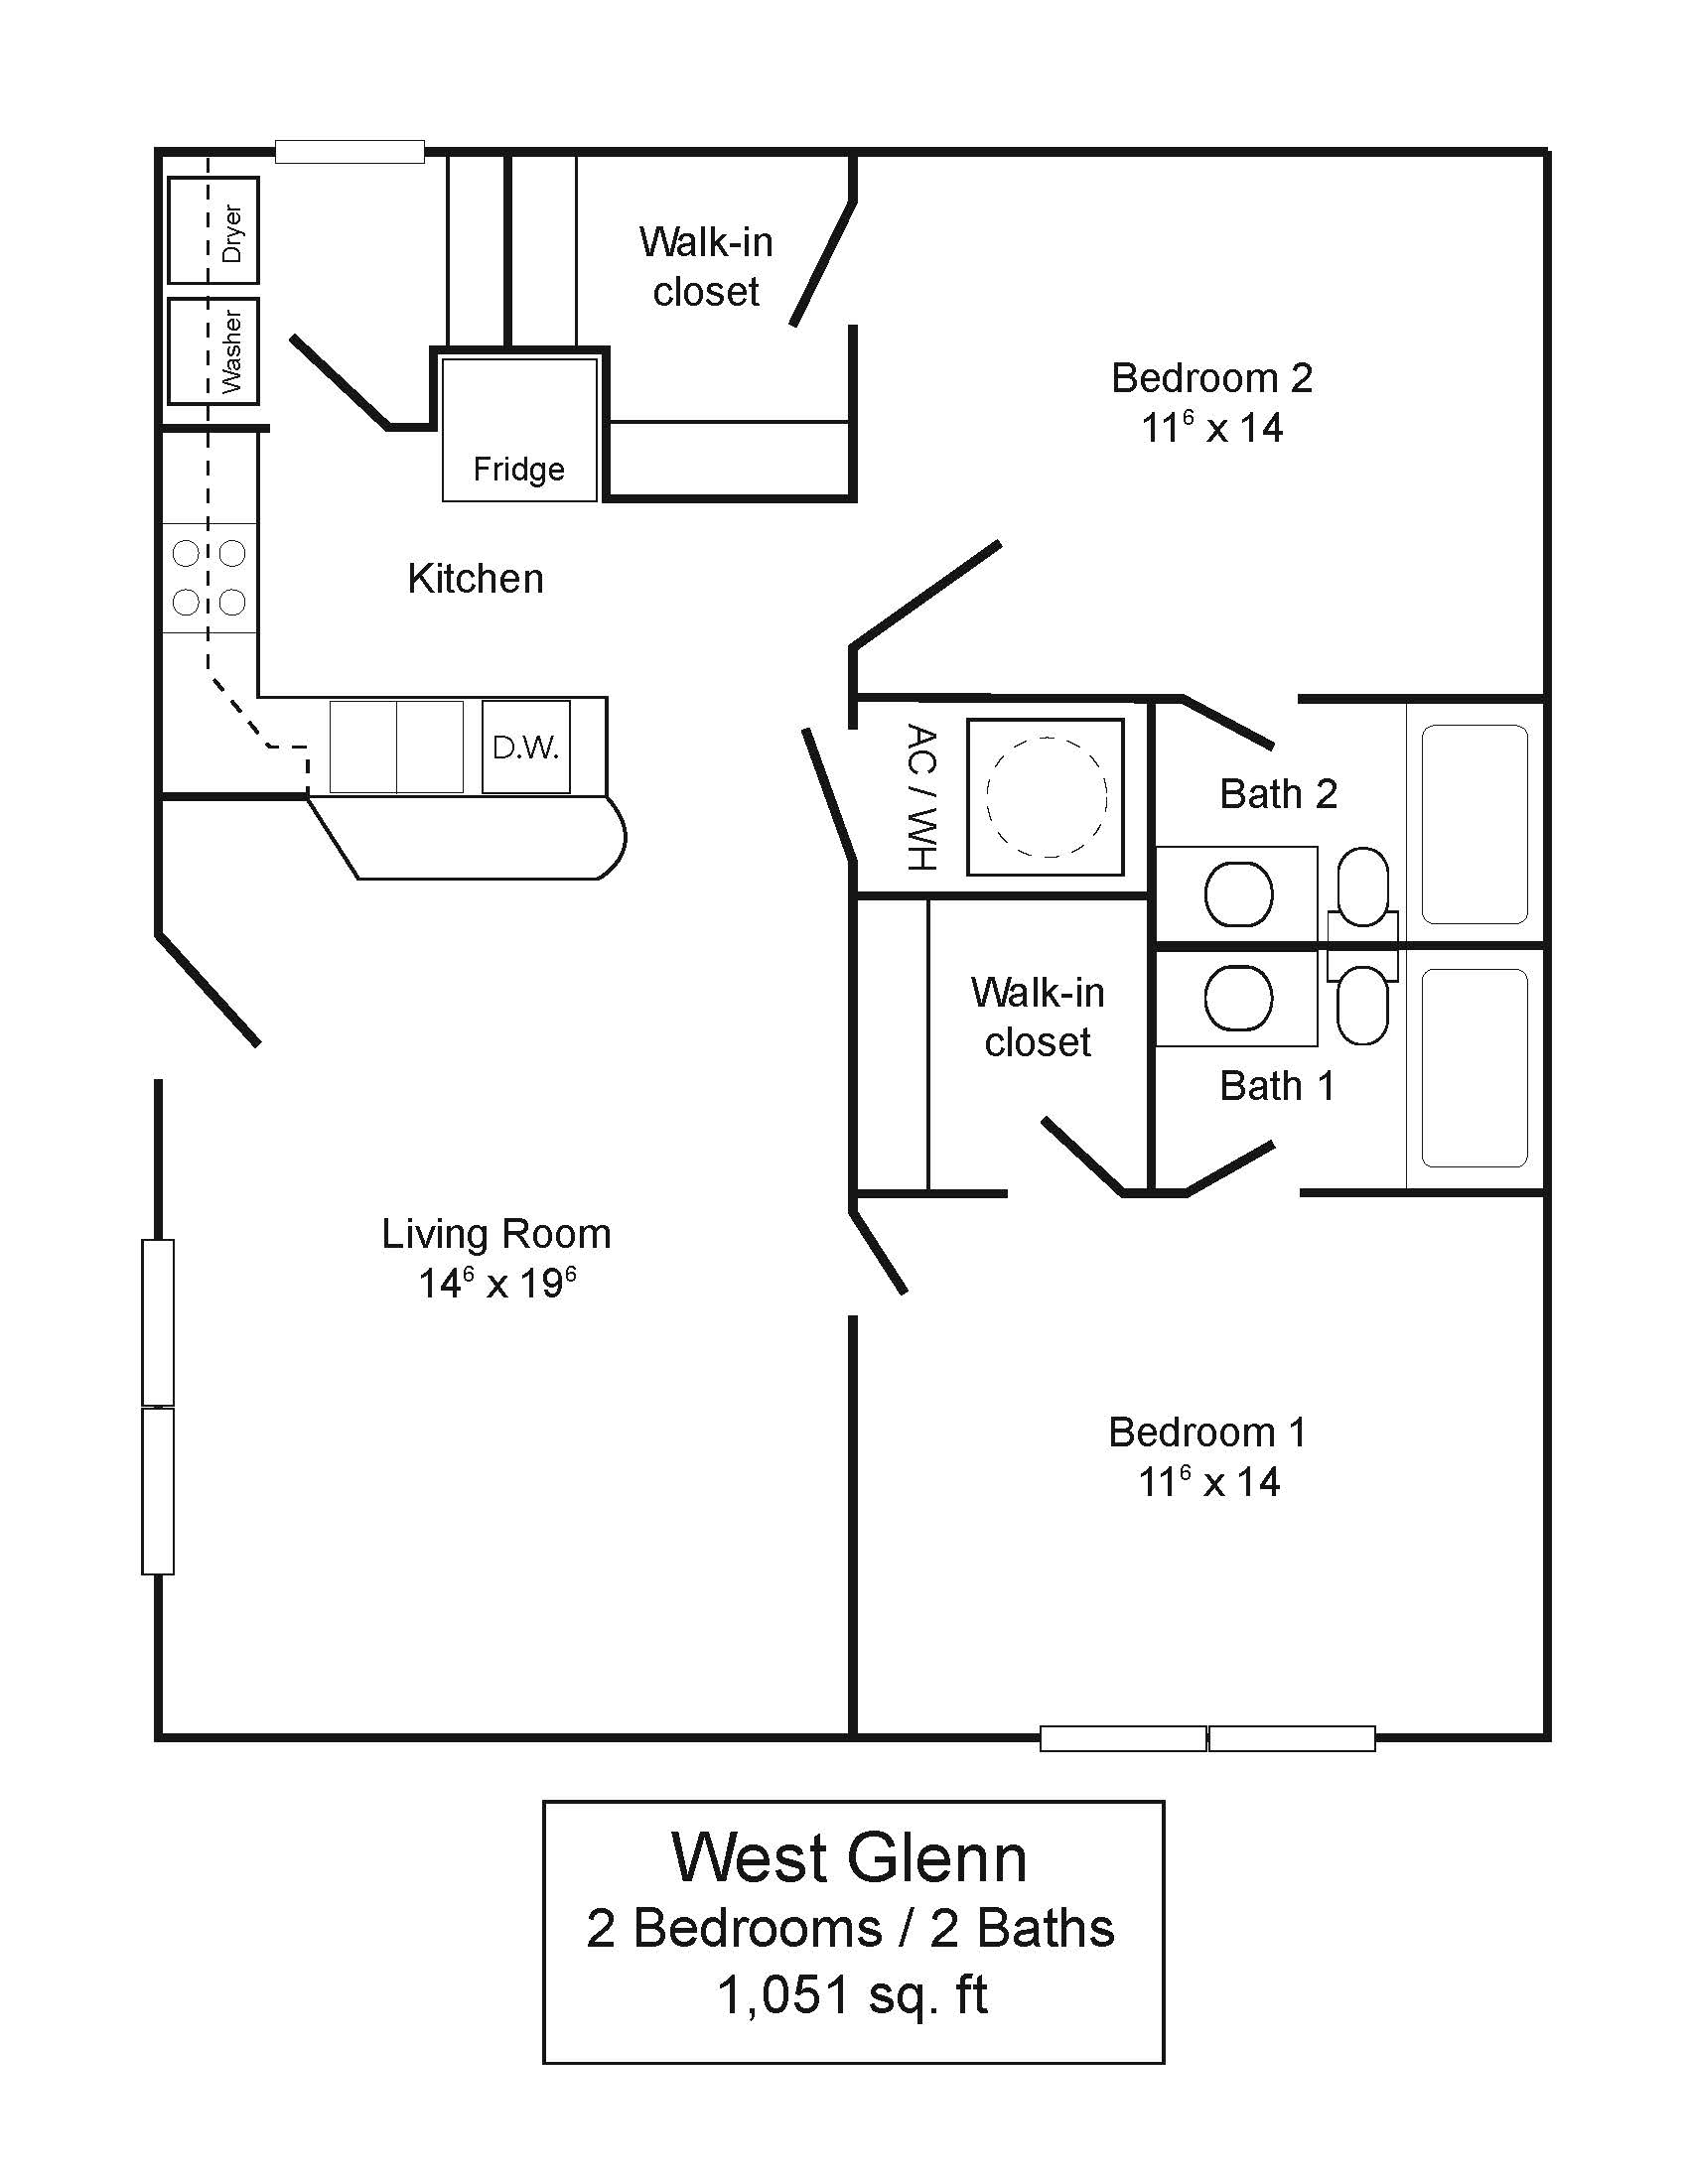 West Glenn 2/2